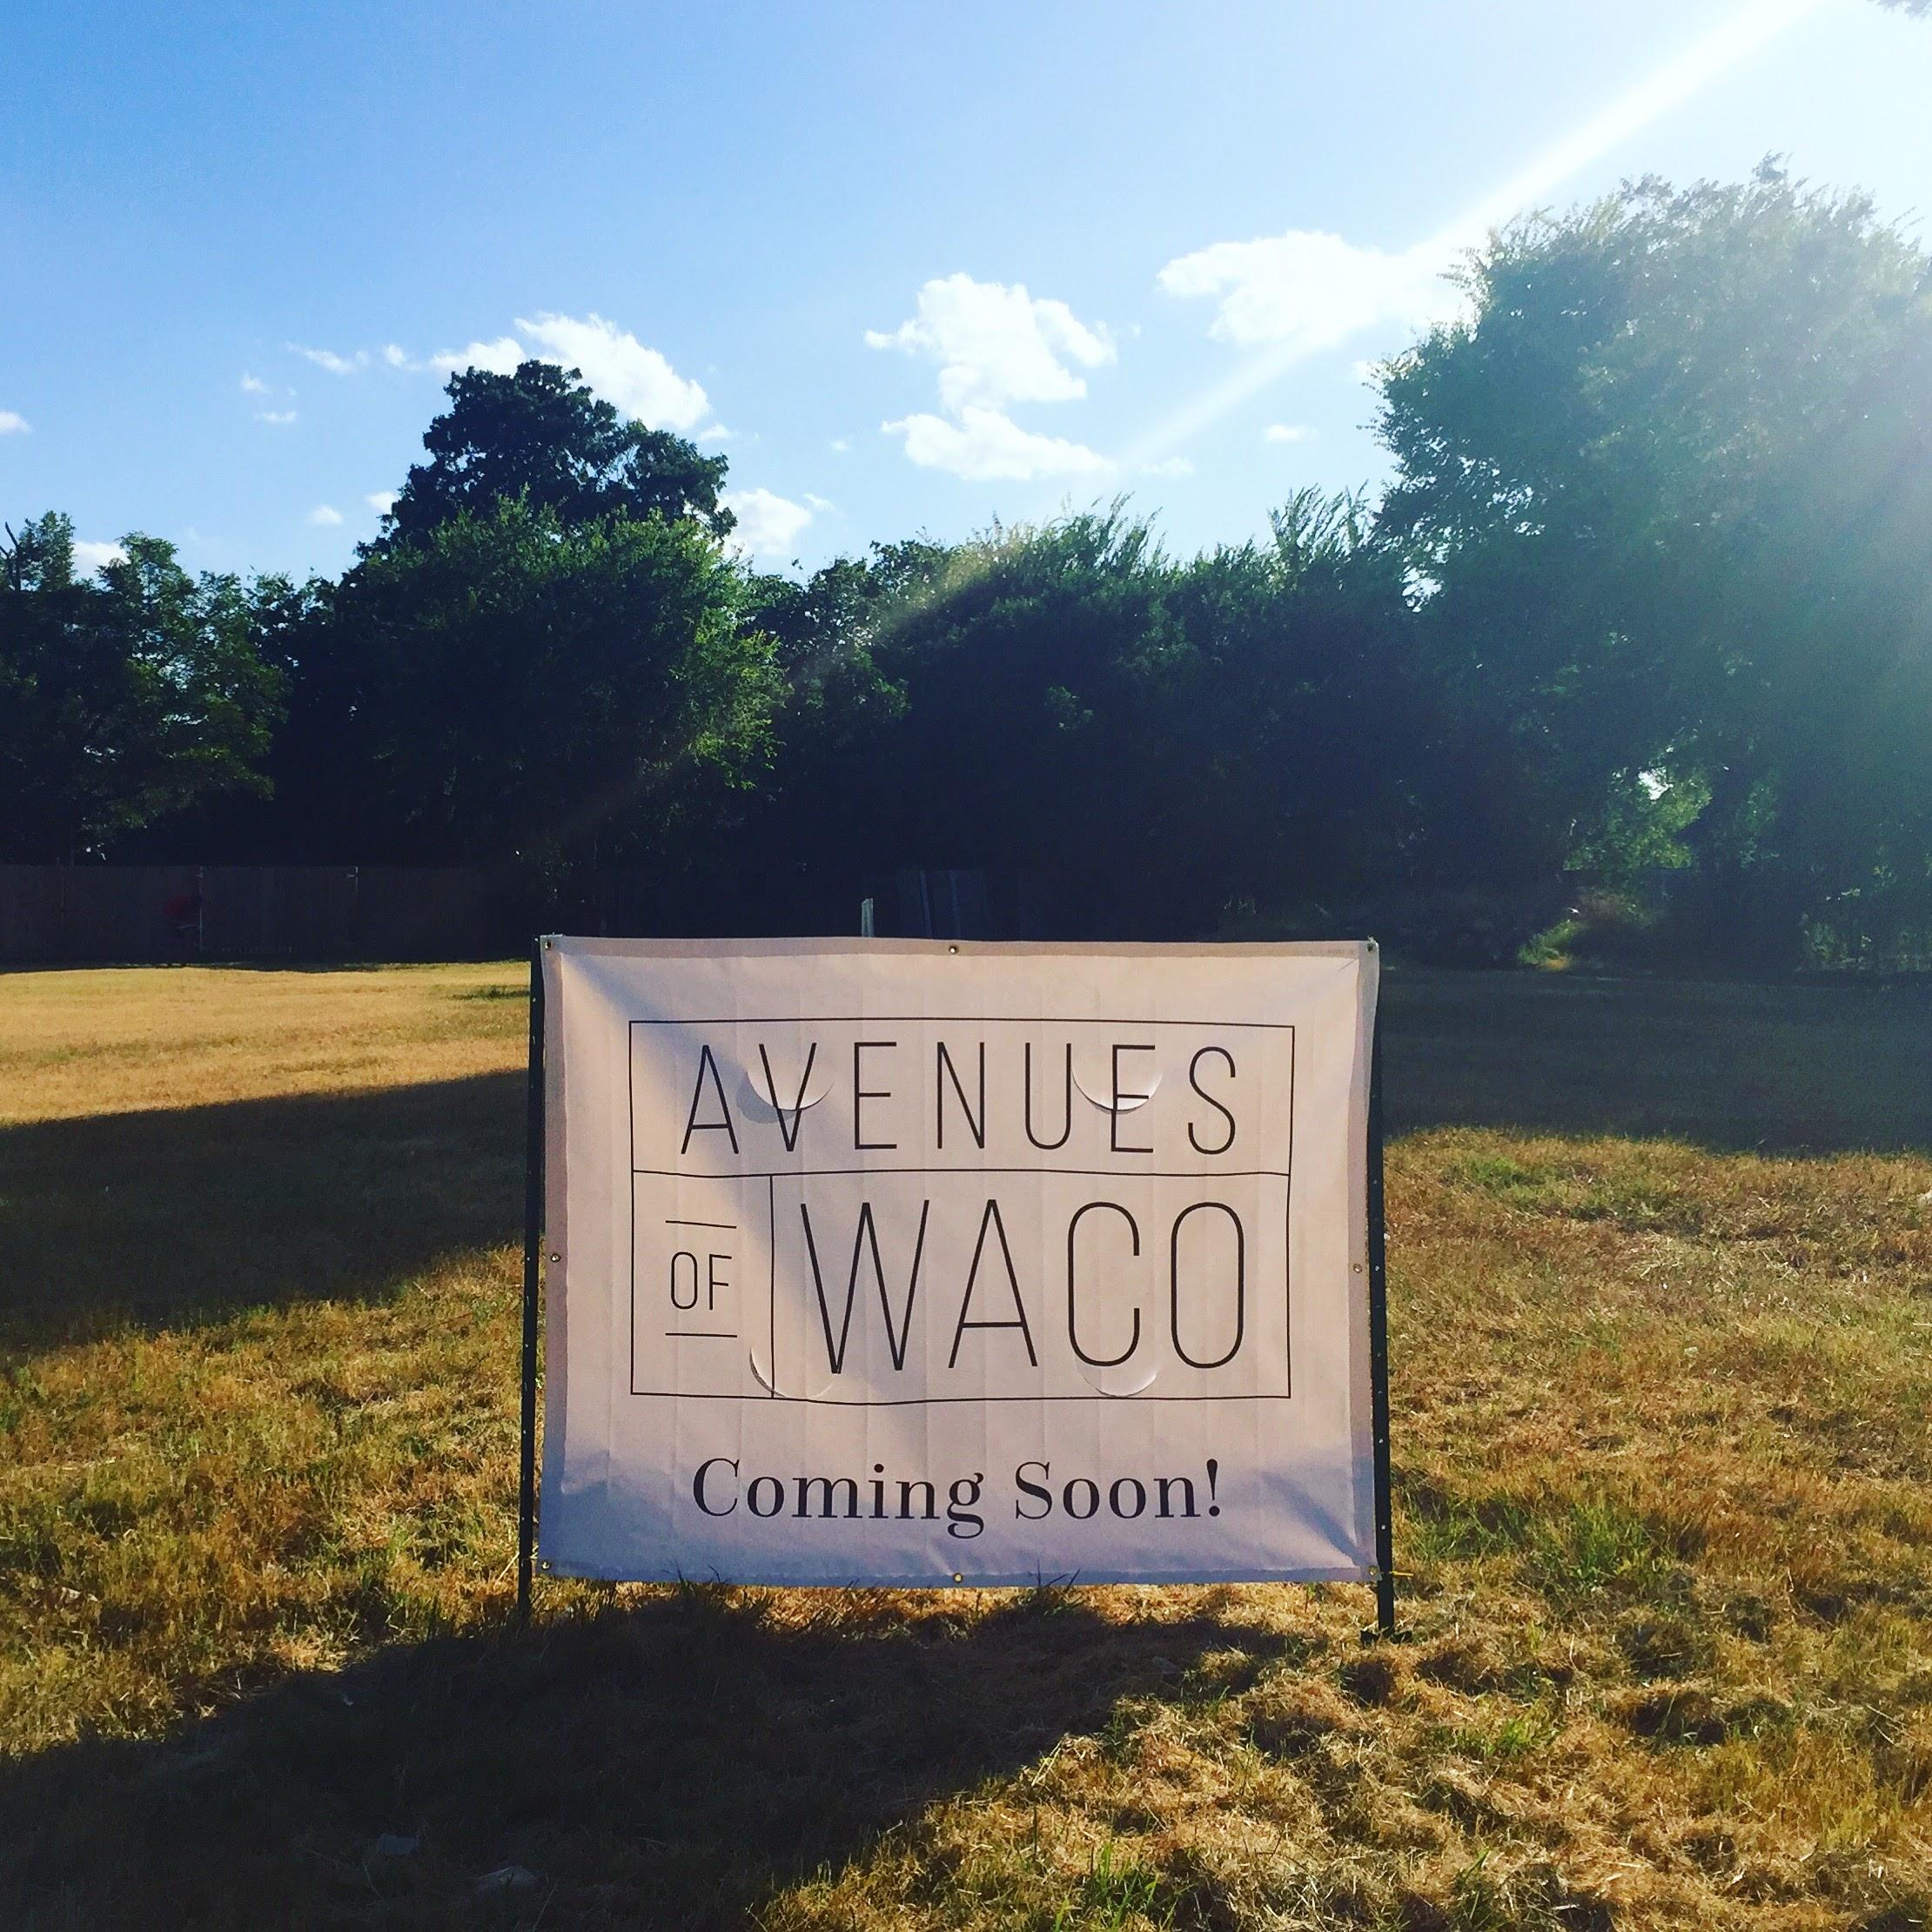 Say hello to Avenues of Waco